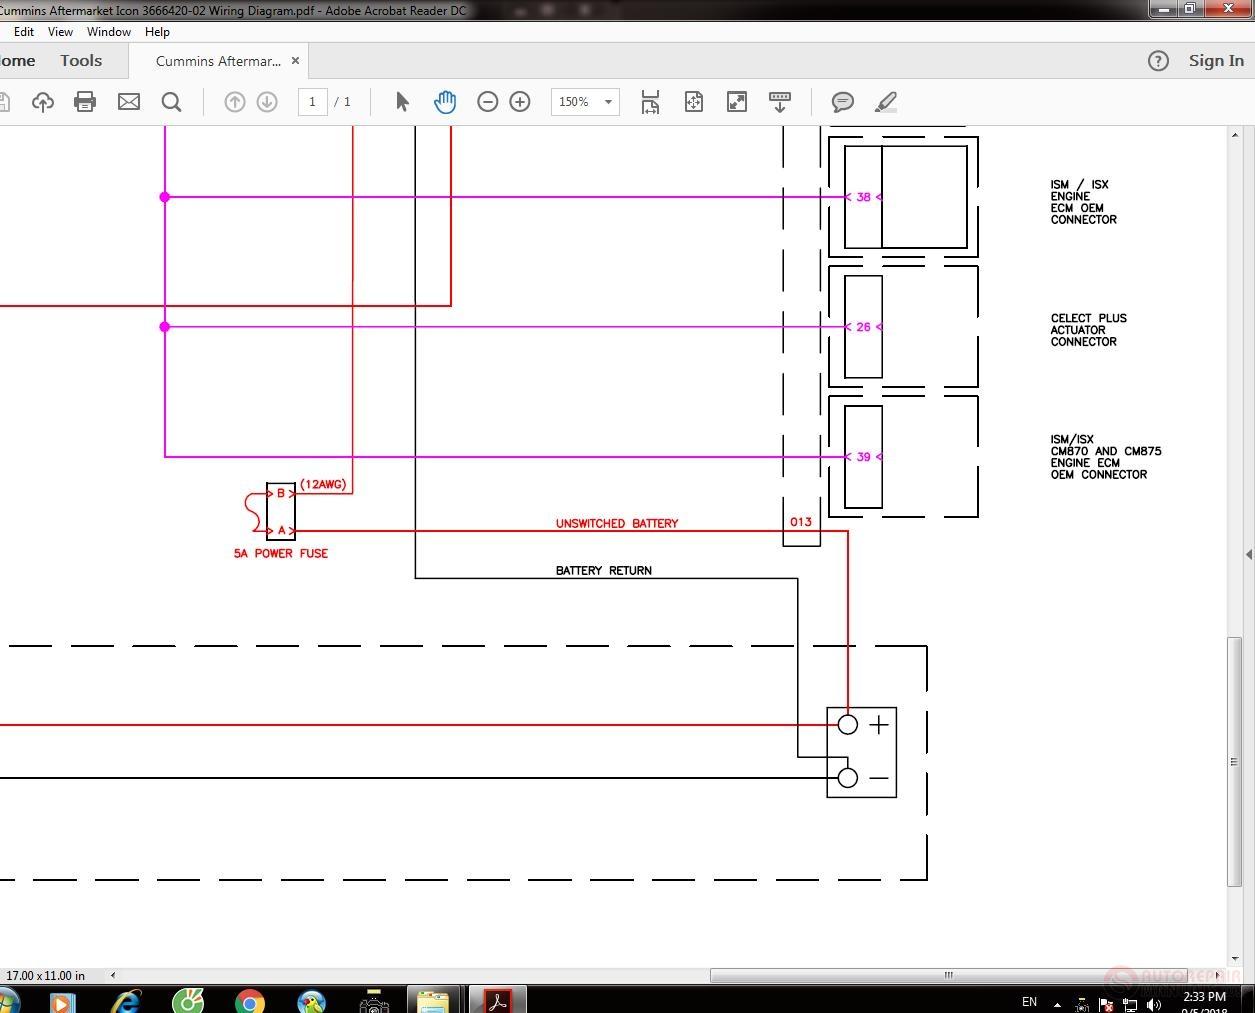 hight resolution of cummins aftermarket icon 3666420 02 wiring diagram